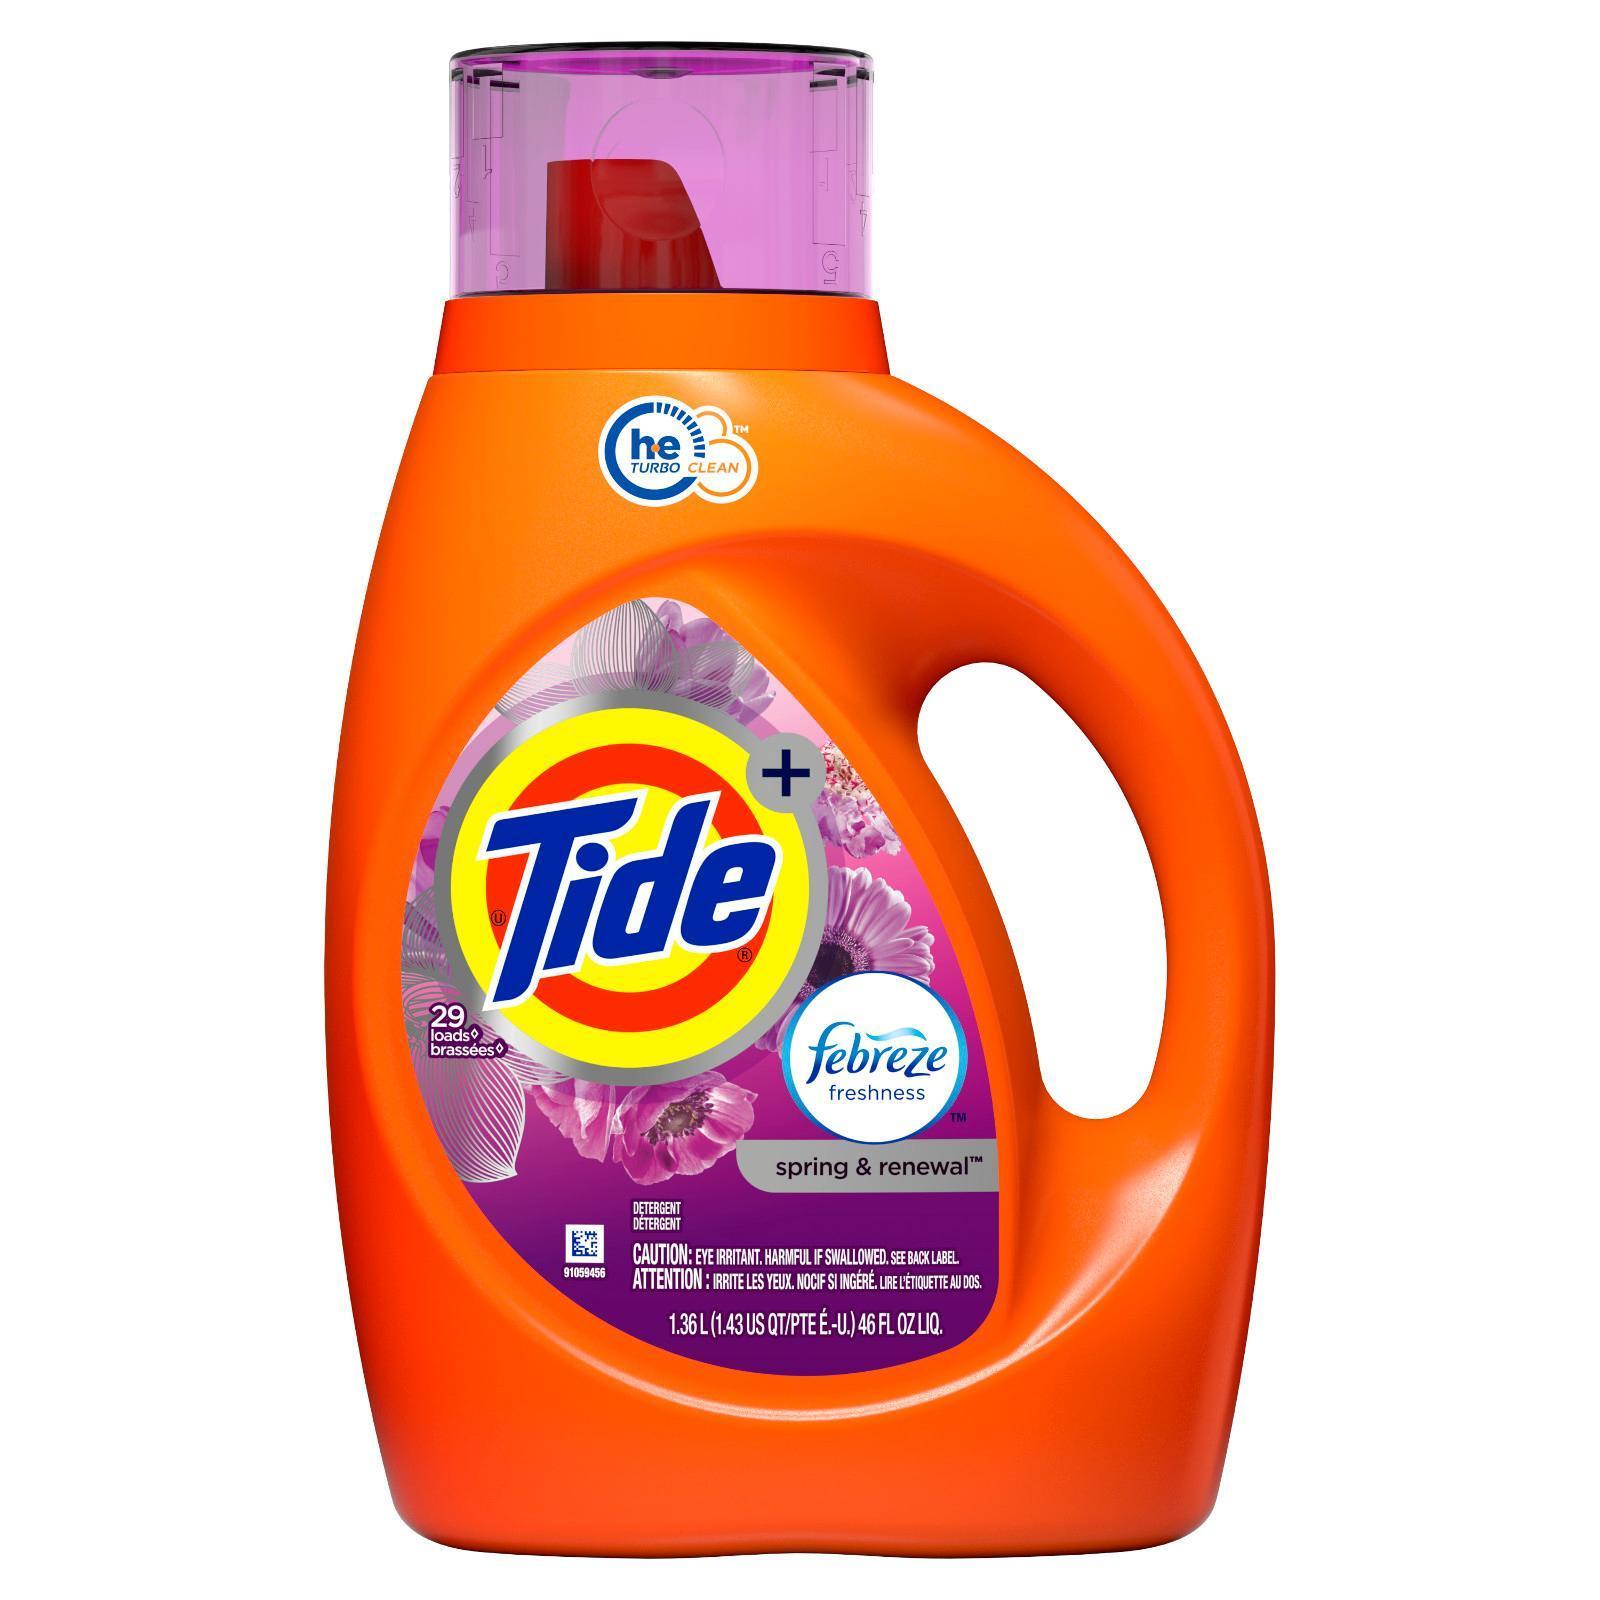 Tide Febreze Freshness Spring & Renewal Scent HE Liquid Laundry Detergent